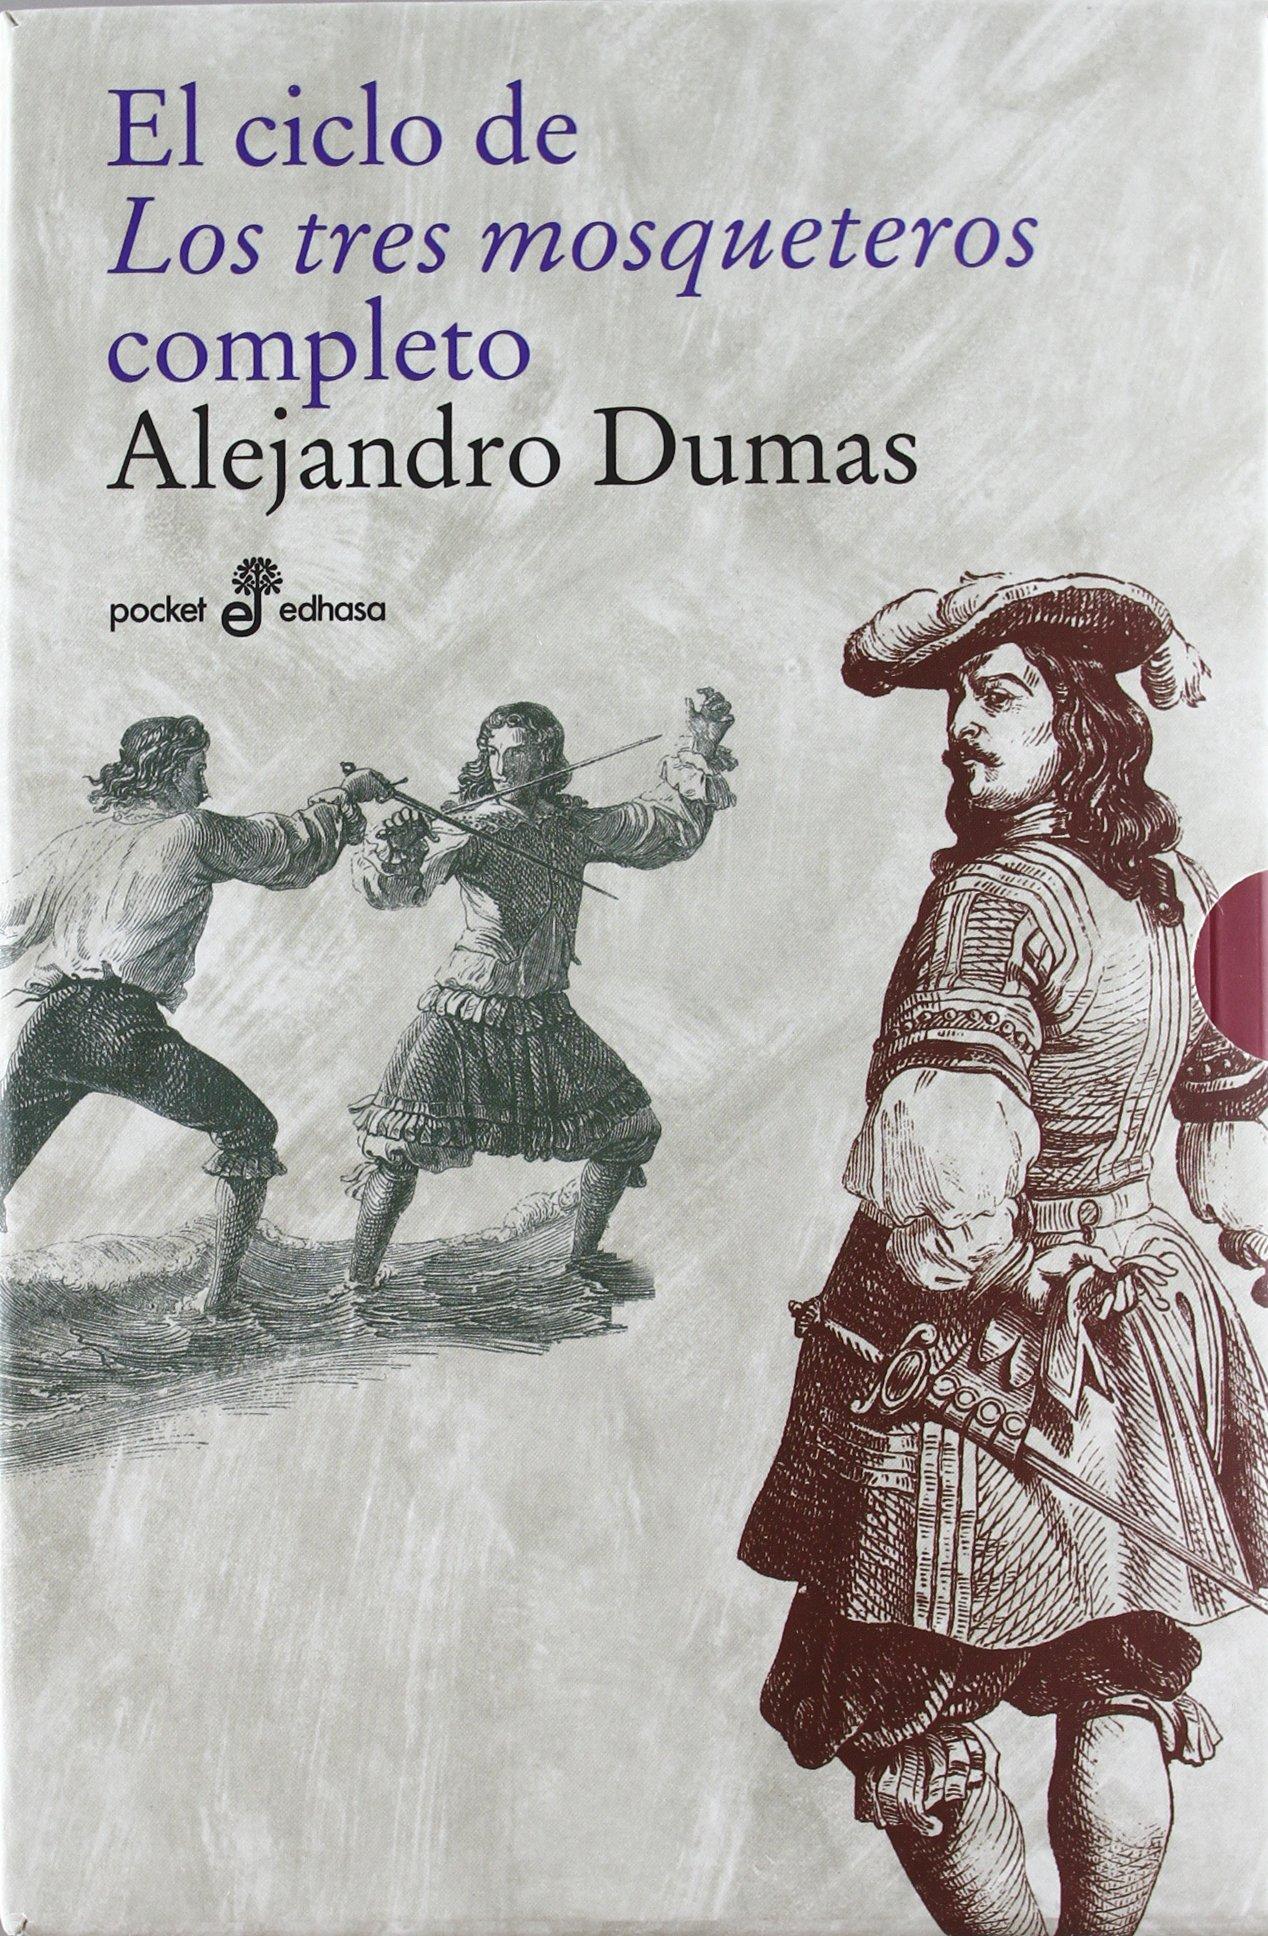 Los tres mosqueteros (obra completa 3 vols) (Xl (edhasa)) Tapa blanda – 10 oct 2011 Alejandro Dumas S.A. 8435019187 Adventure